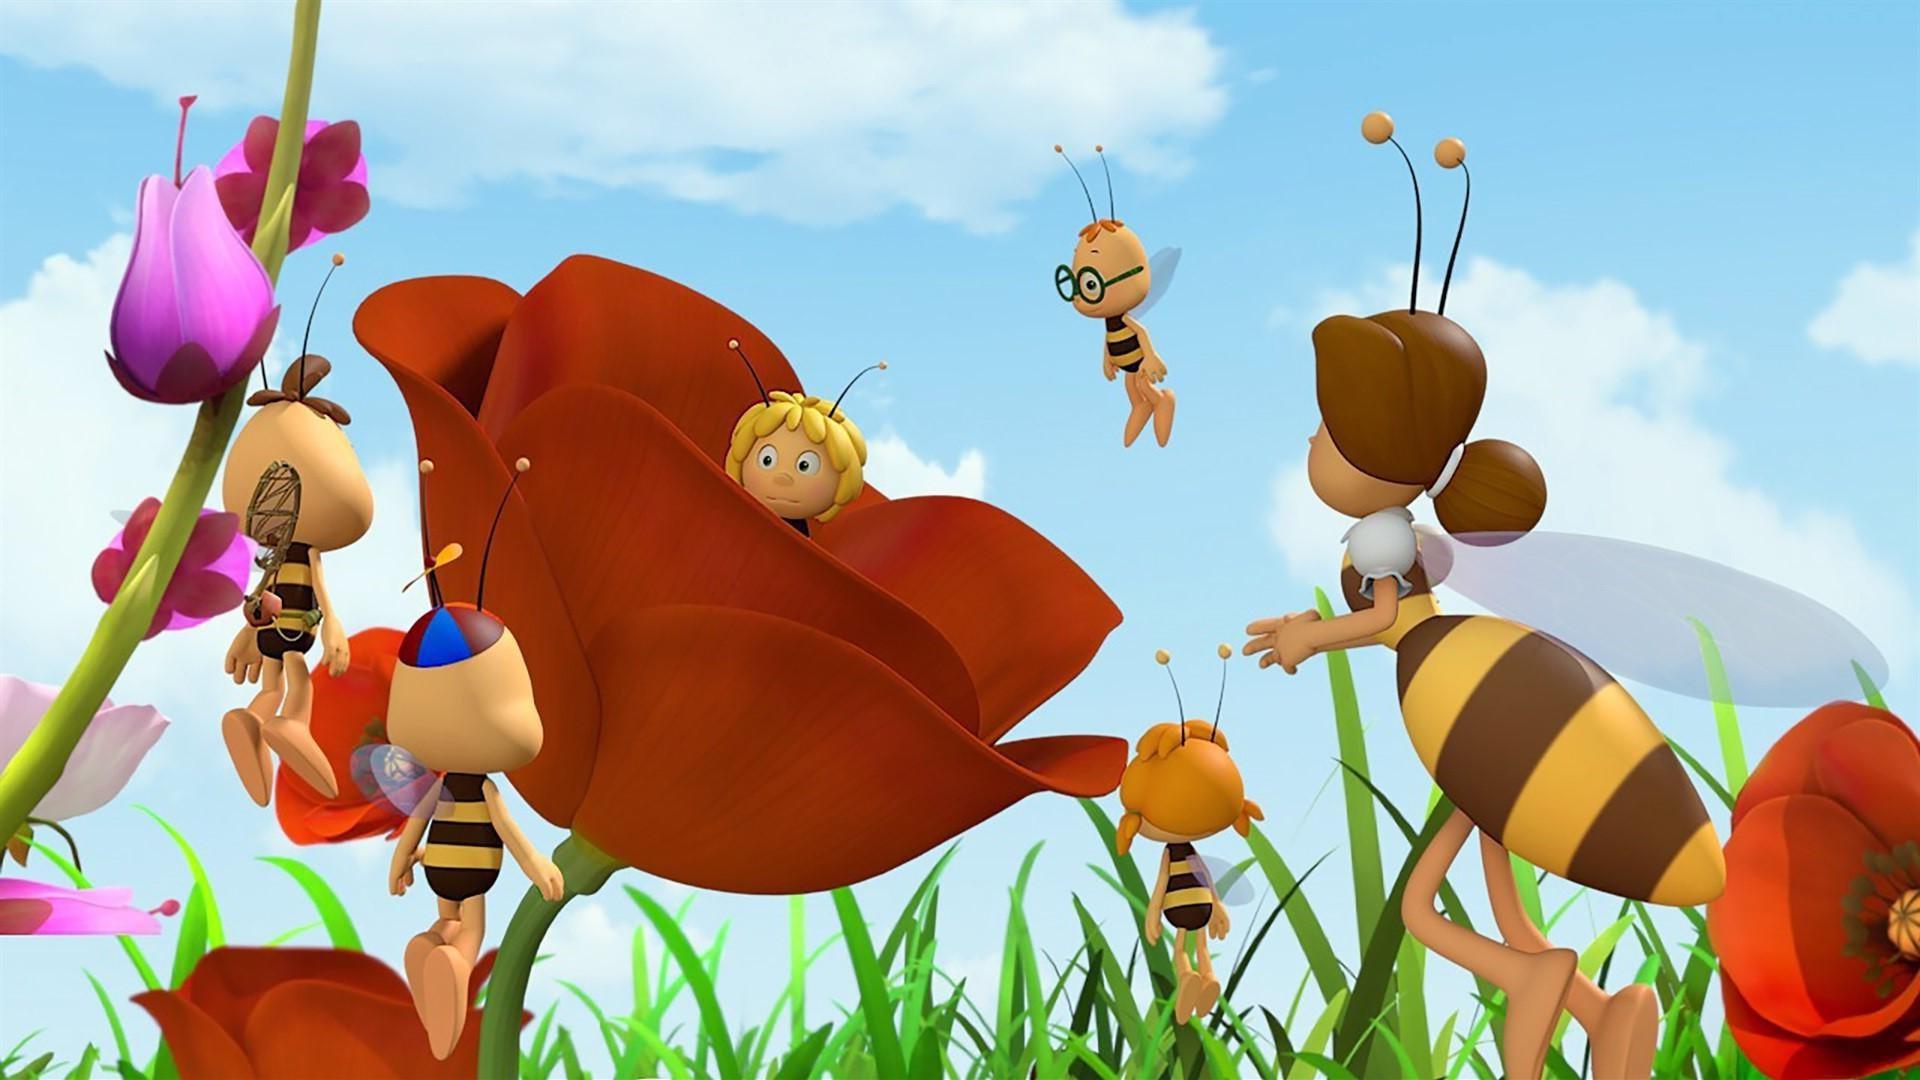 Malvorlage Biene Maja Neu 21 Neu Ausmalbilder Biene Maja – Malvorlagen Ideen Bild